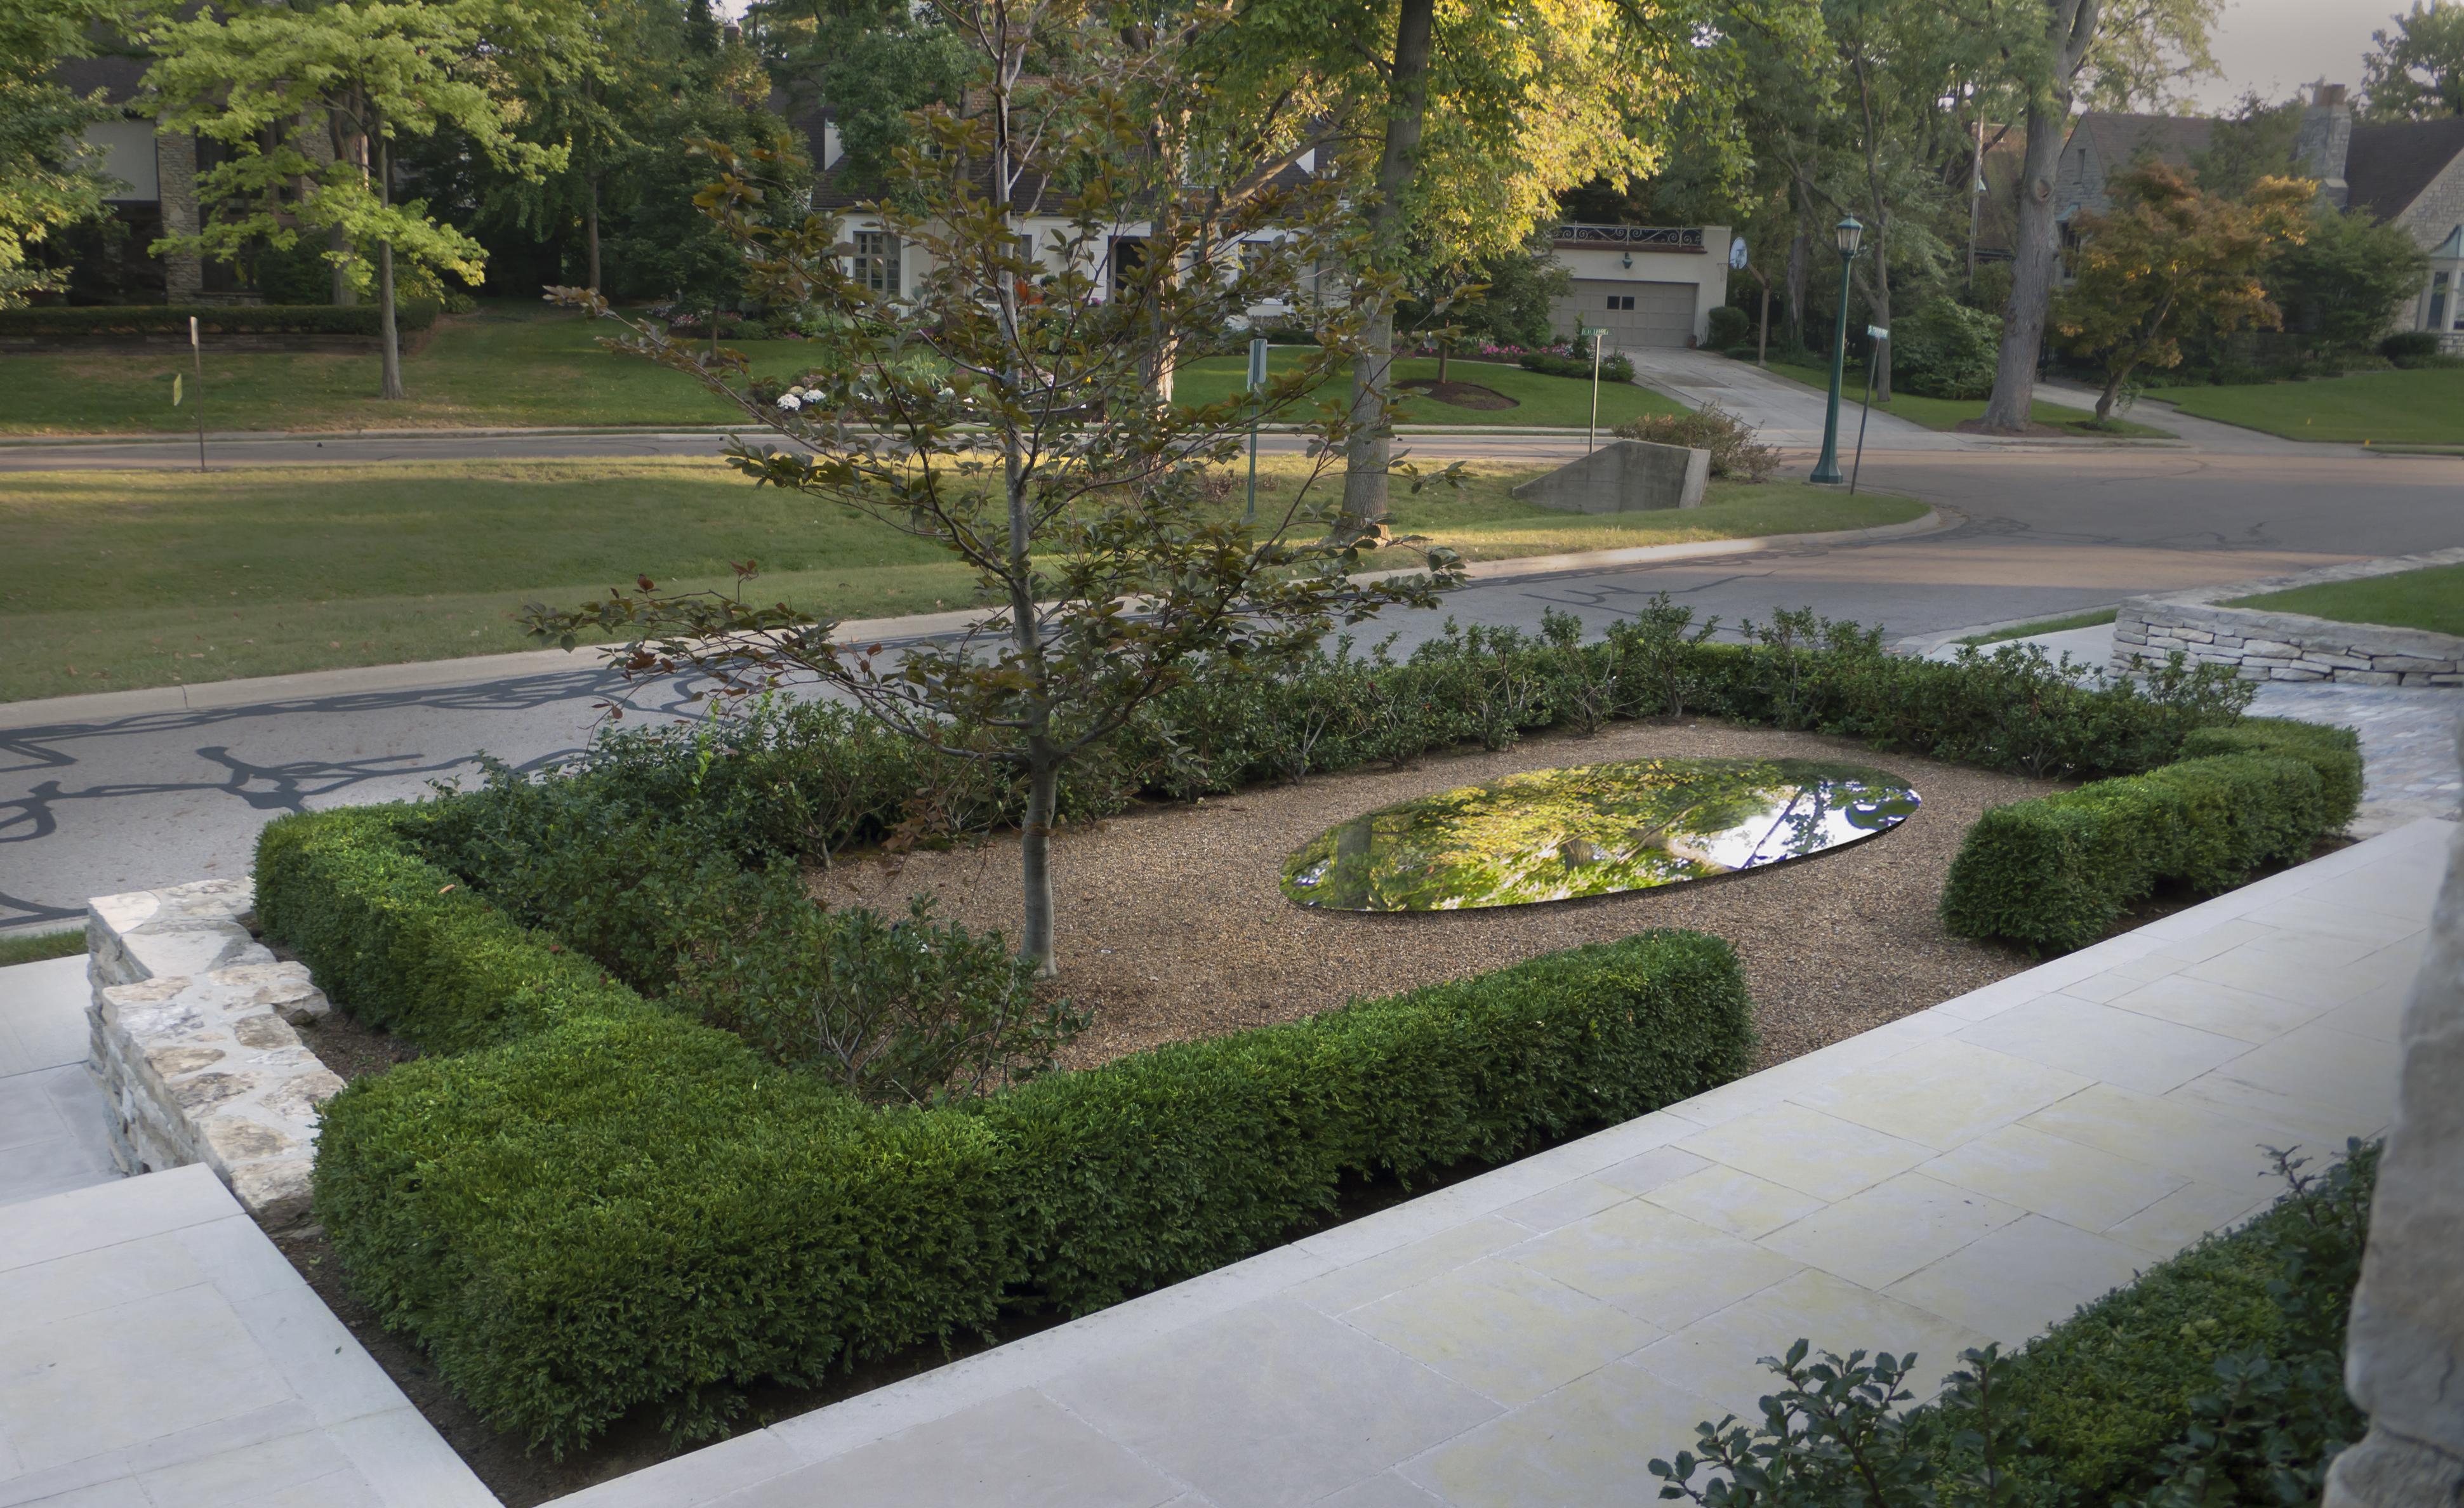 Garden design llc inspiration garden design llc for Garden design llc